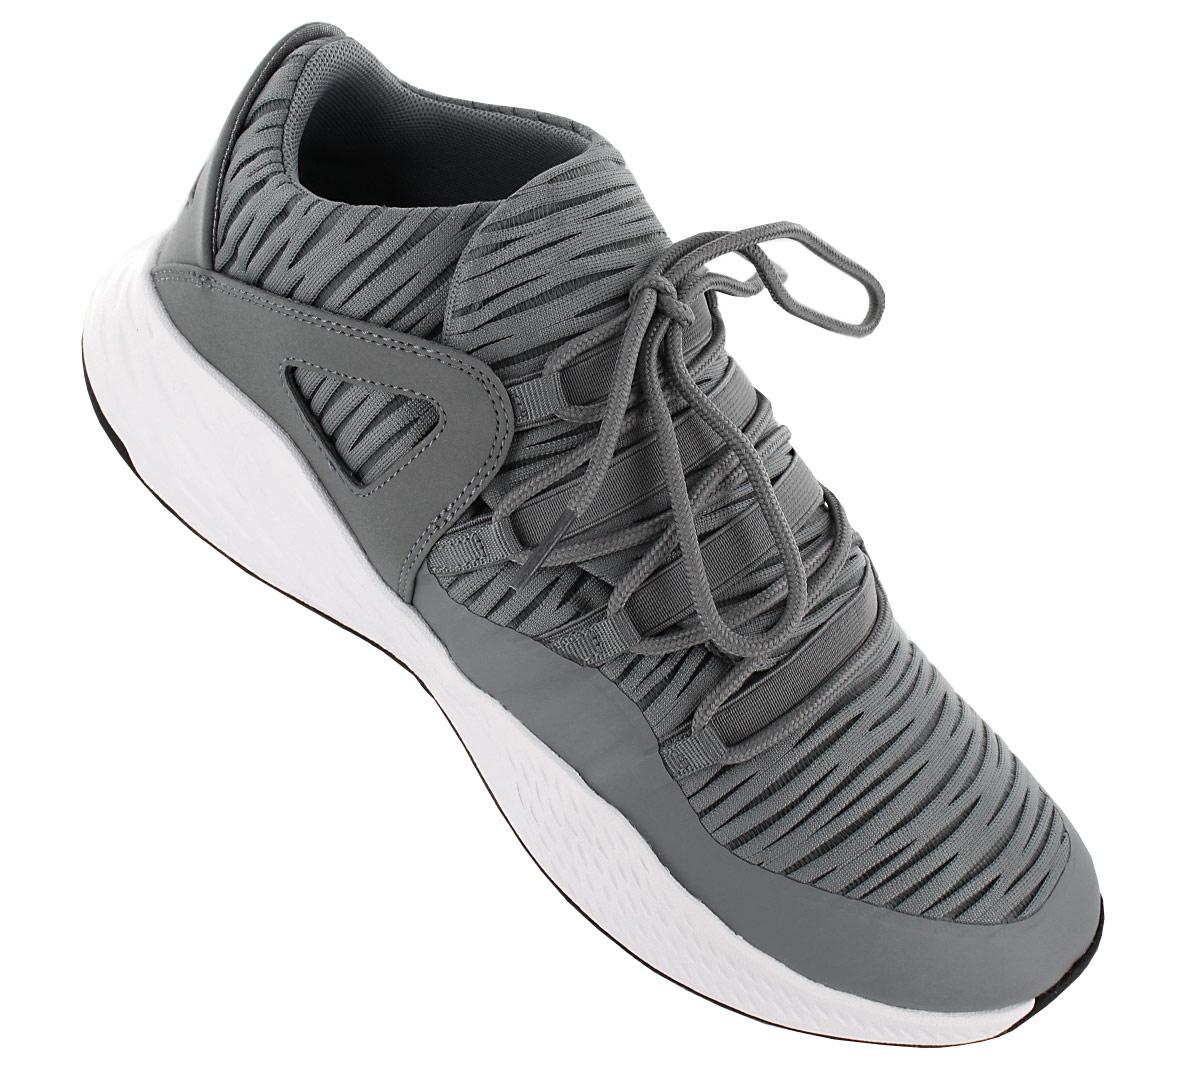 5ab8d2c54829f1 Nike Air Jordan Formula 23 Low Men s Trainers Shoes 919724 004 New ...